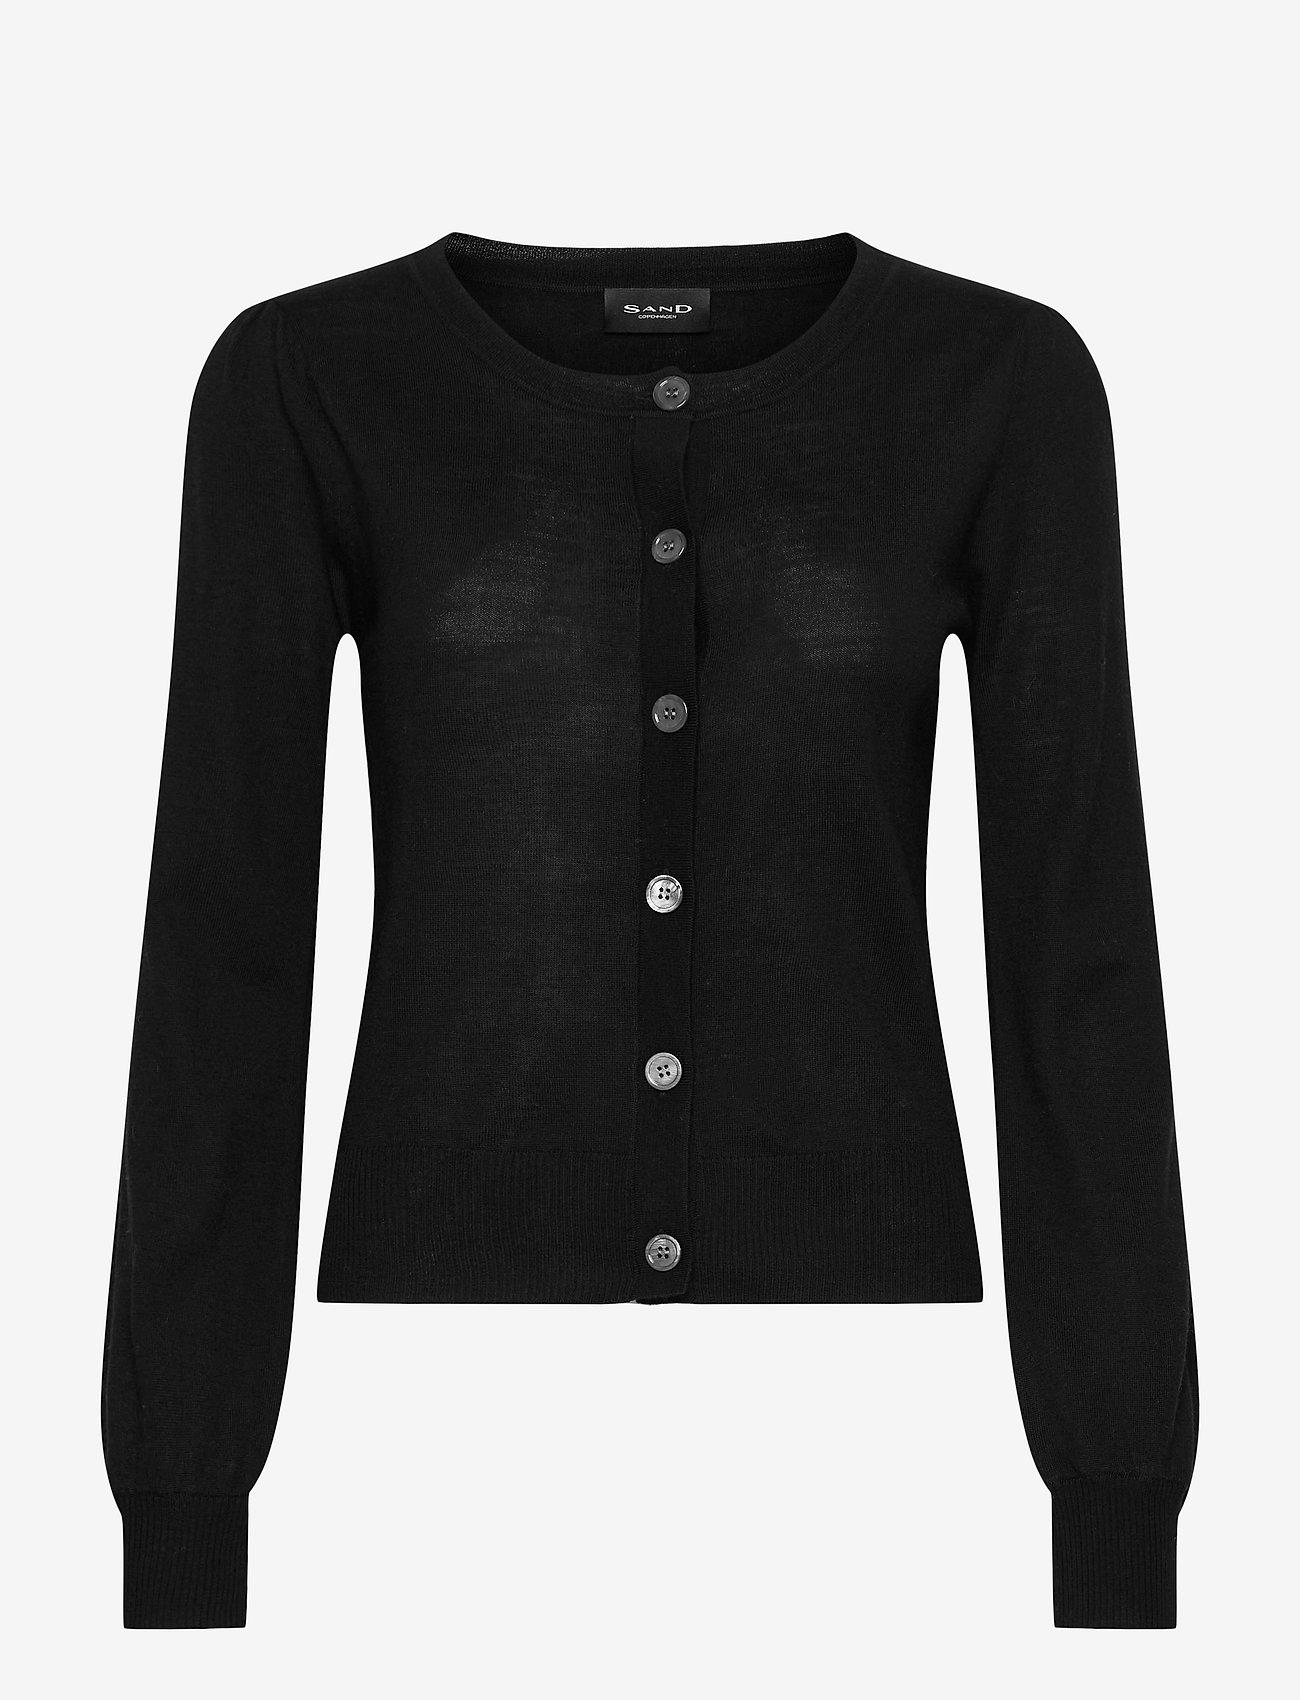 SAND - Fellini - Isamu - cardigans - black - 0